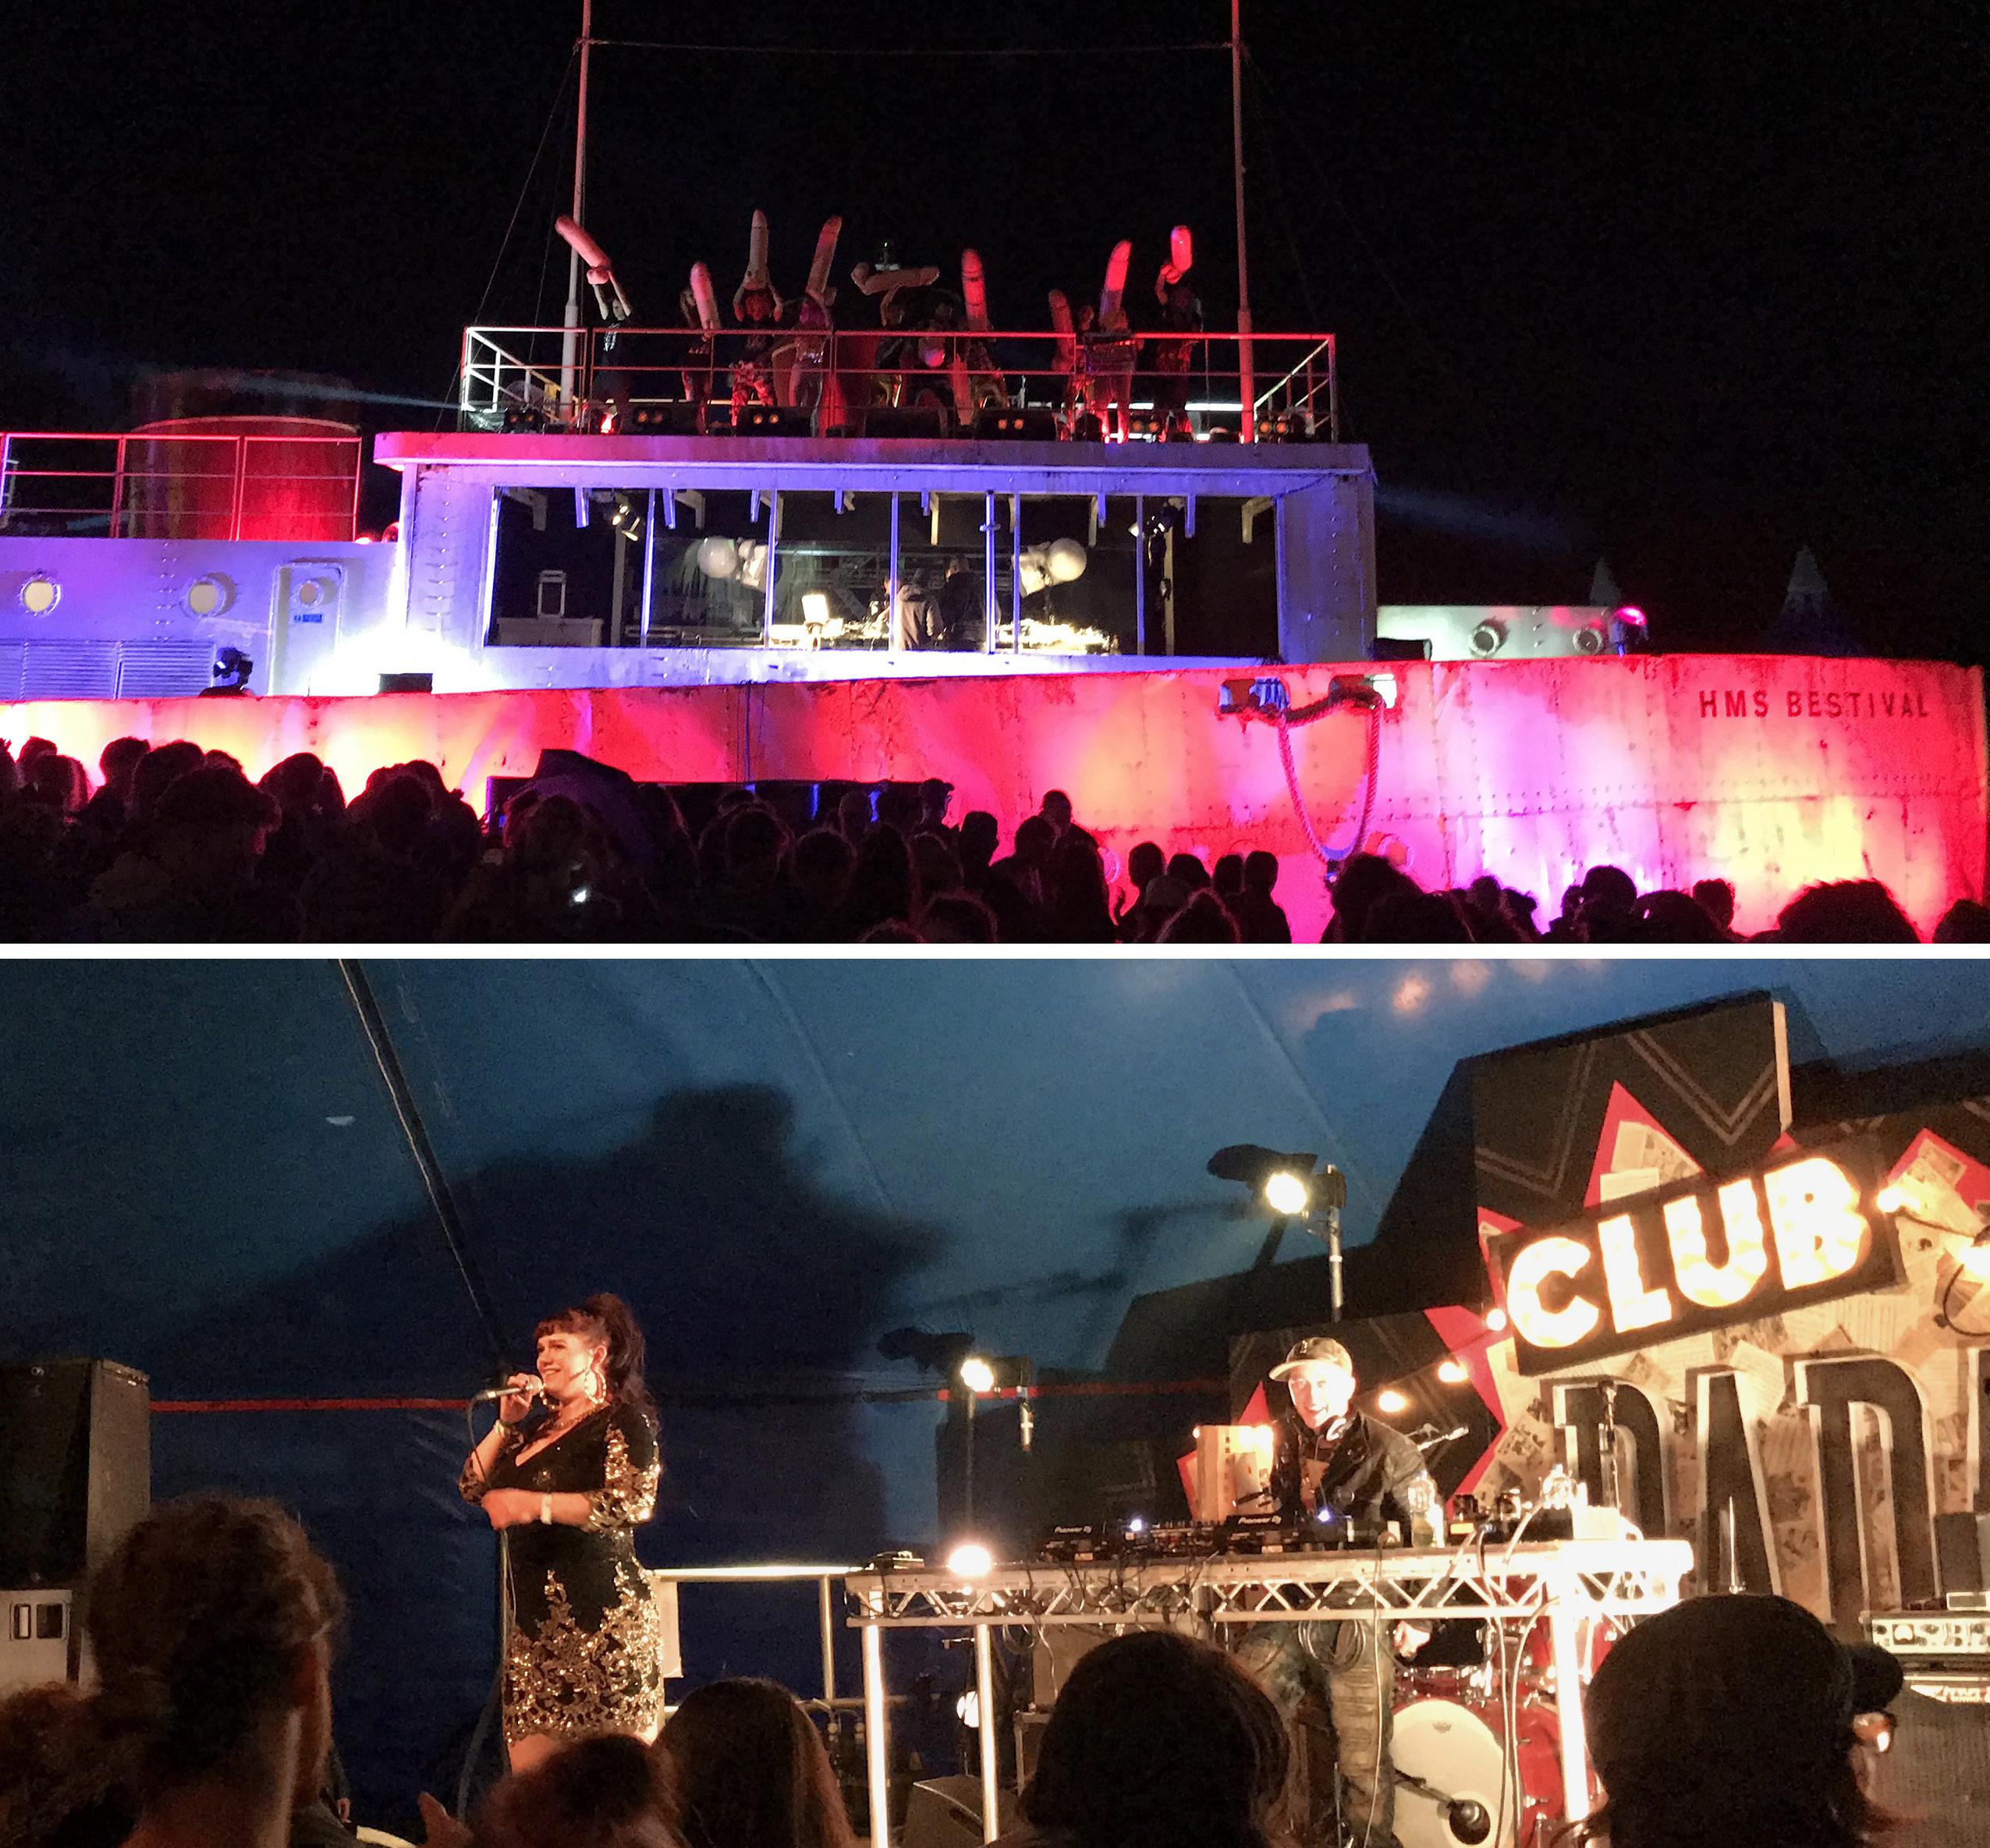 Hard Cock Life at HMS Bestival inflatable penis boat stage, Kathika Rabbit of Slamboree Soundsystem vocals at Club Dada UK festival